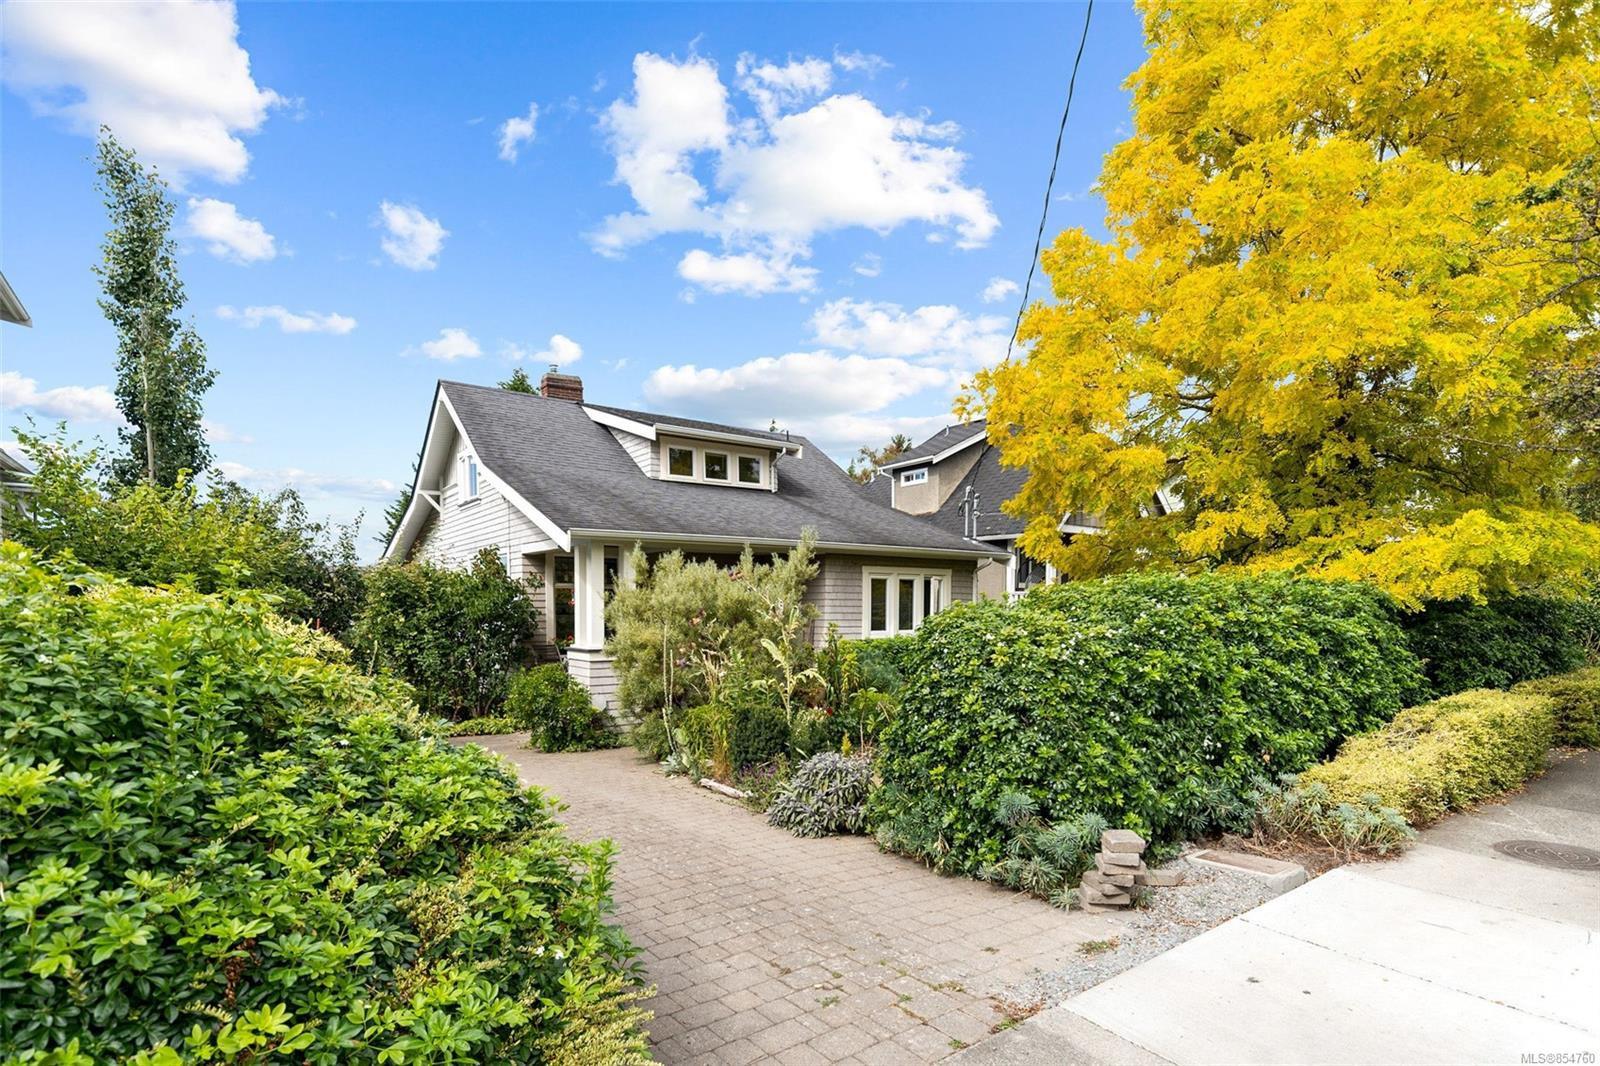 Main Photo: 2728 Blackwood St in : Vi Hillside House for sale (Victoria)  : MLS®# 854760